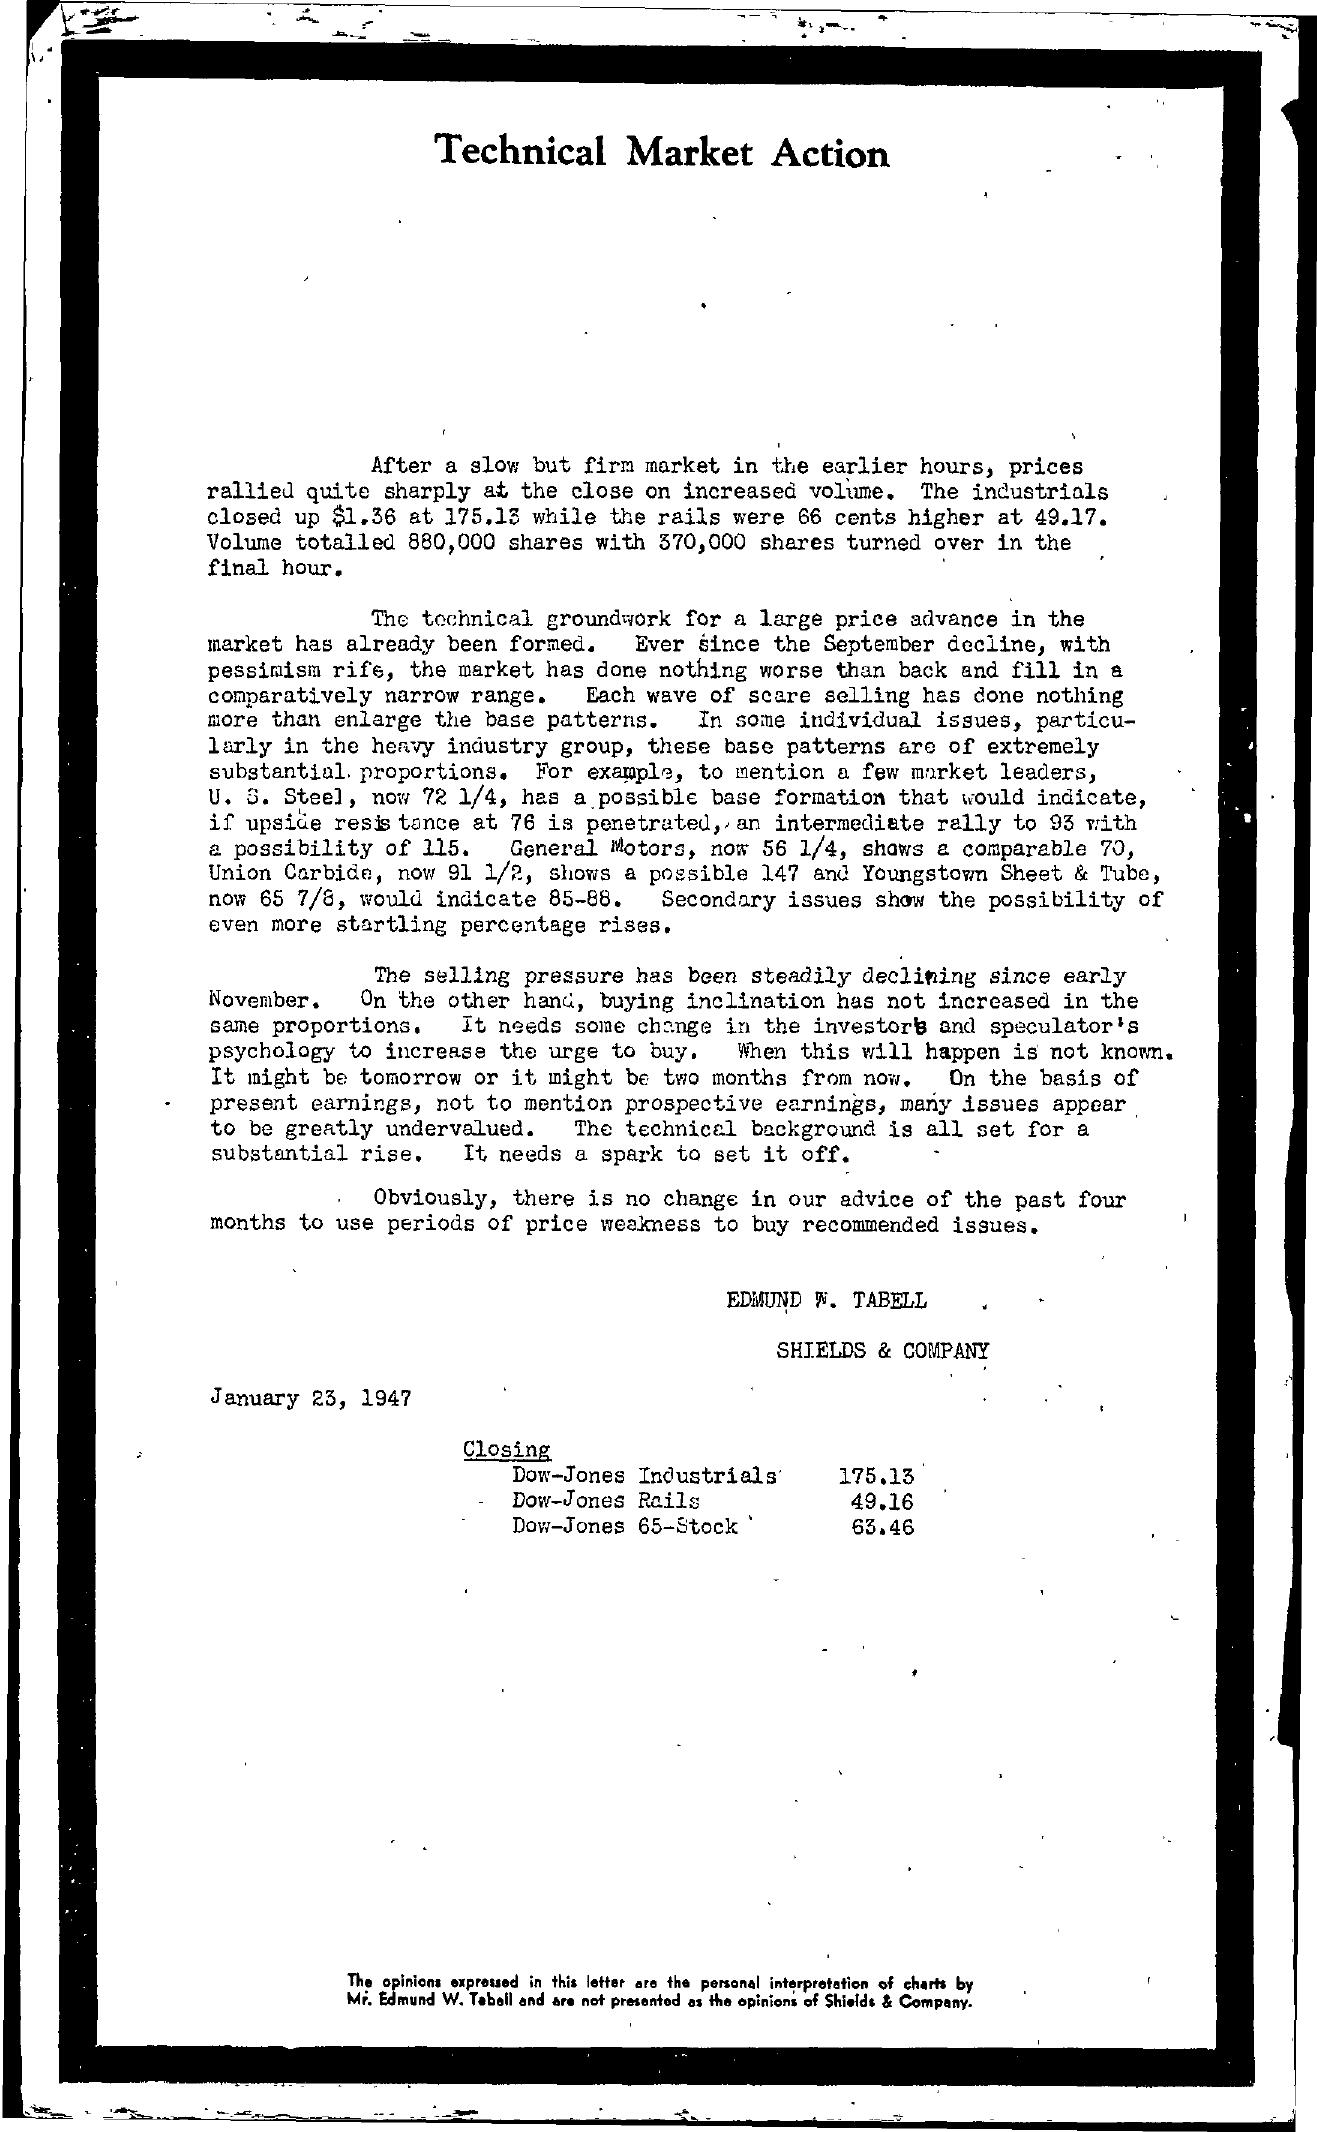 Tabell's Market Letter - January 23, 1947